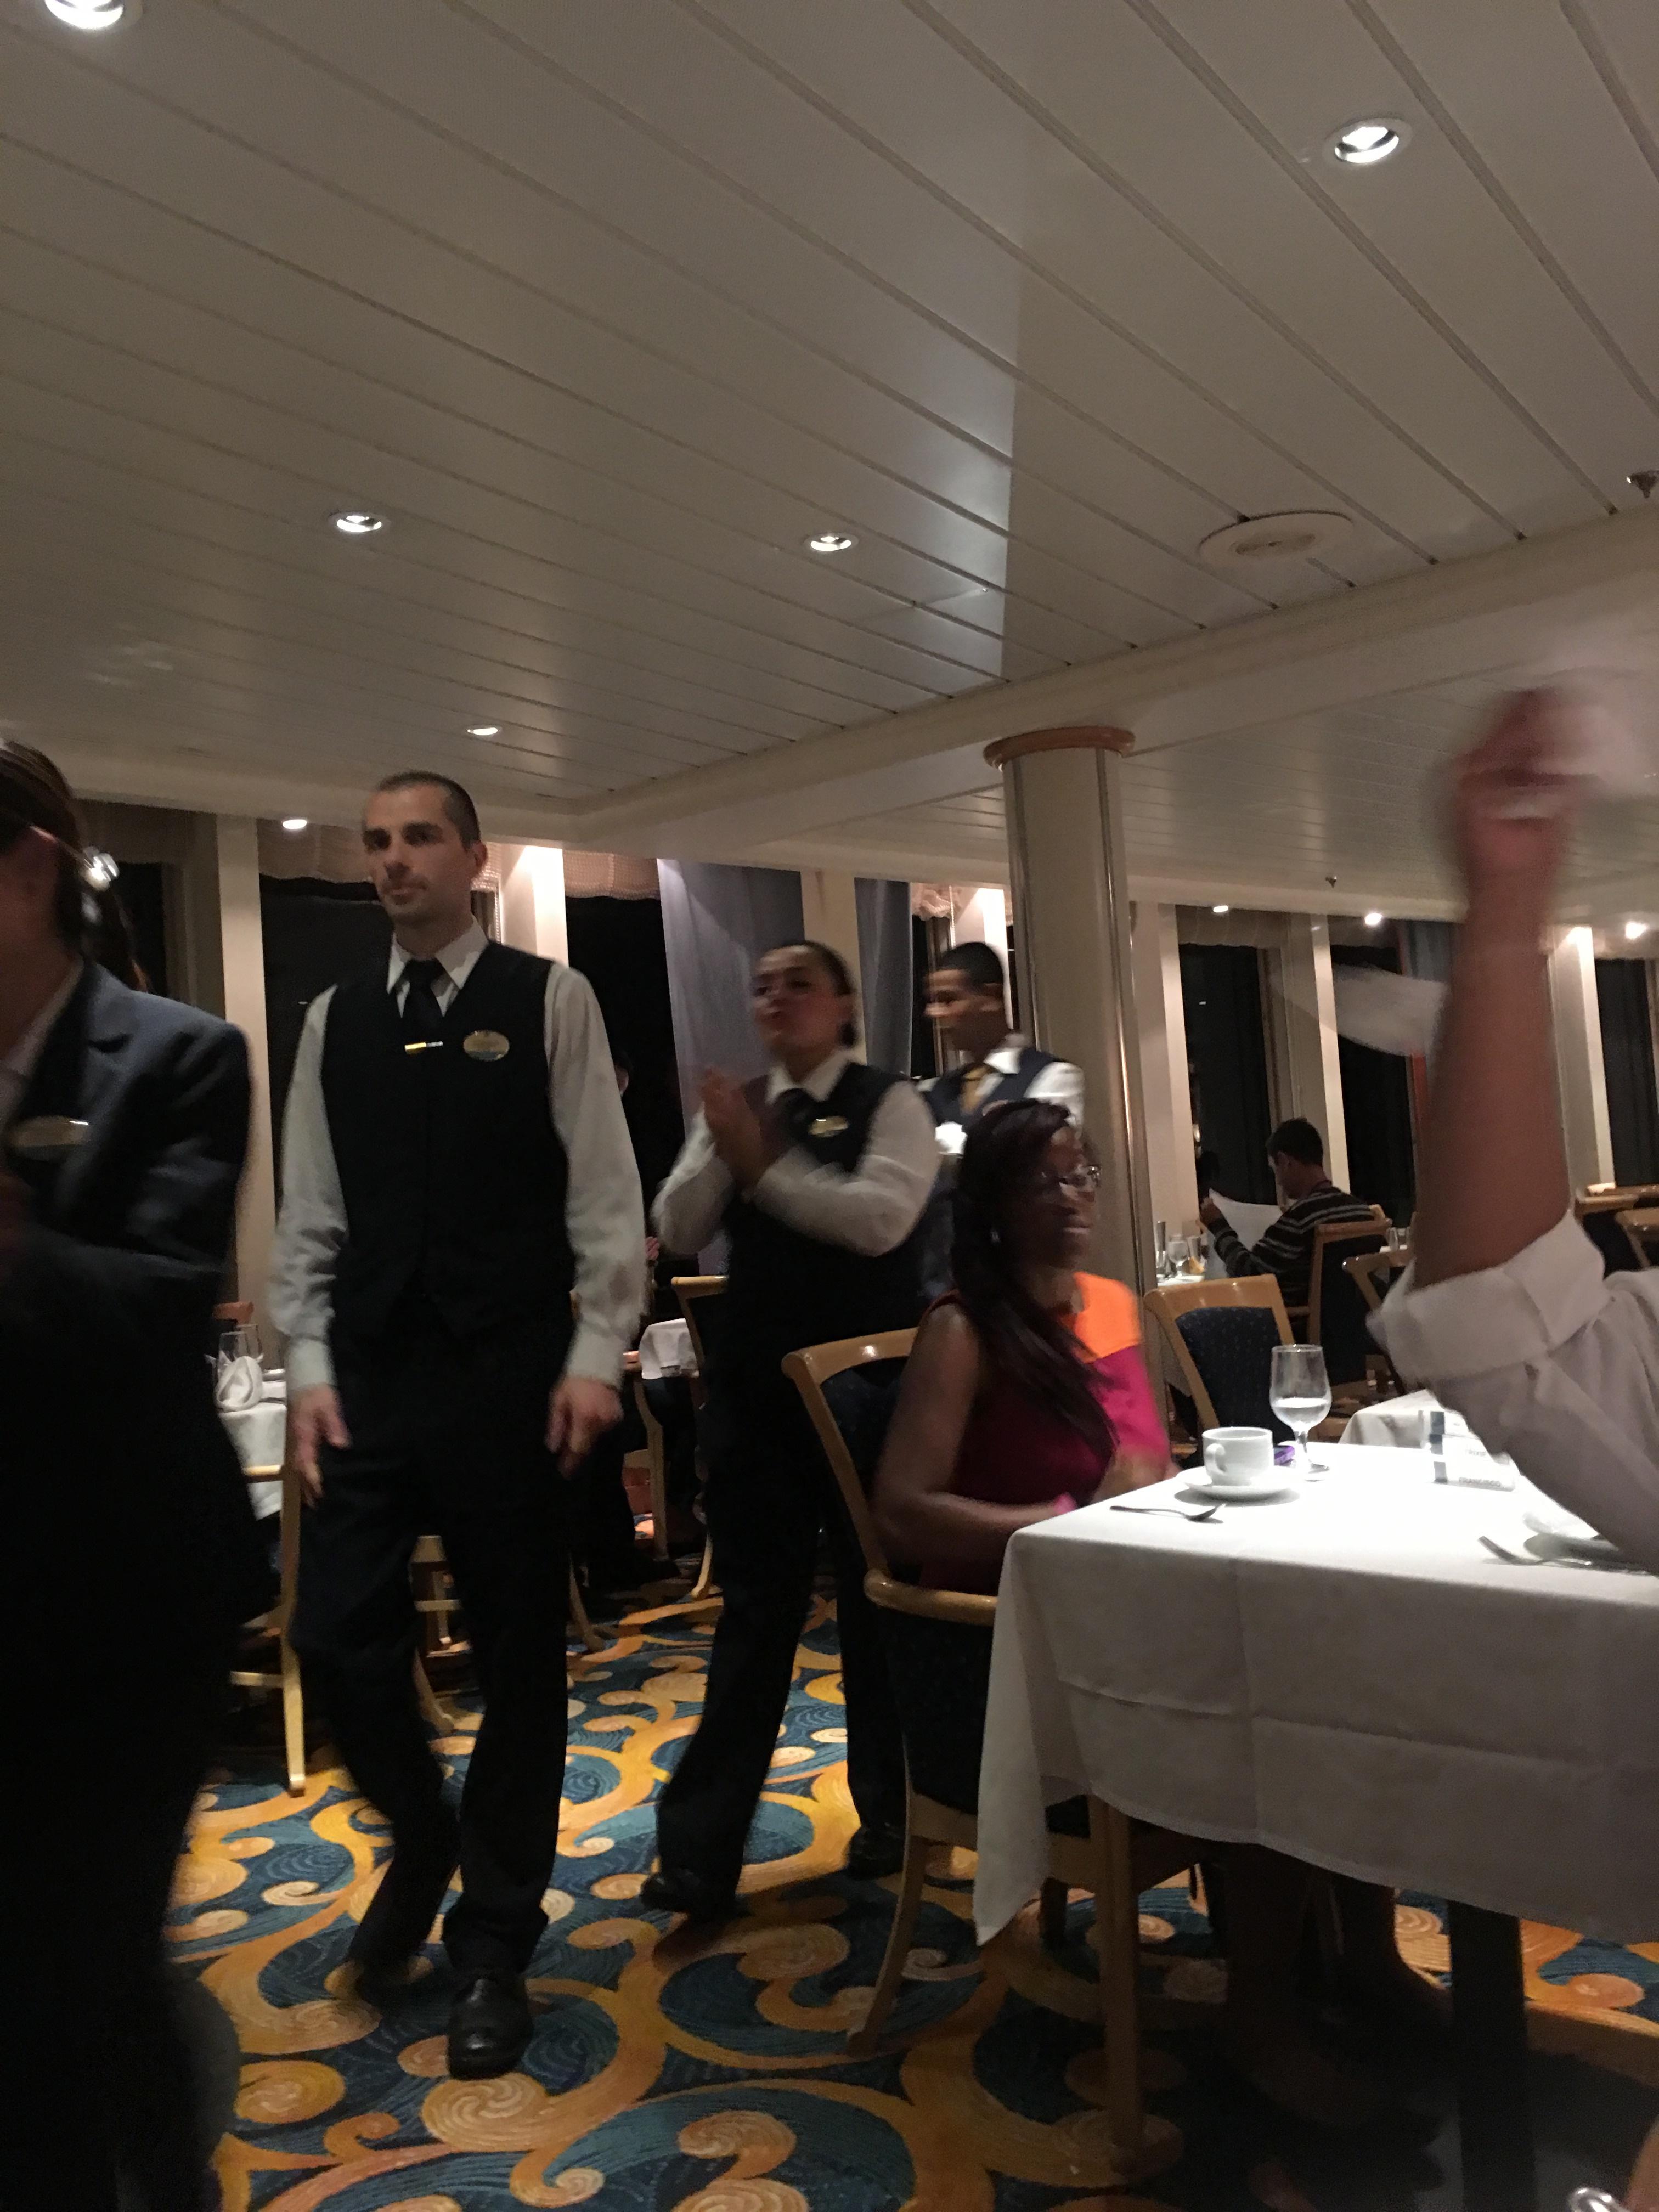 Terrific dining staff